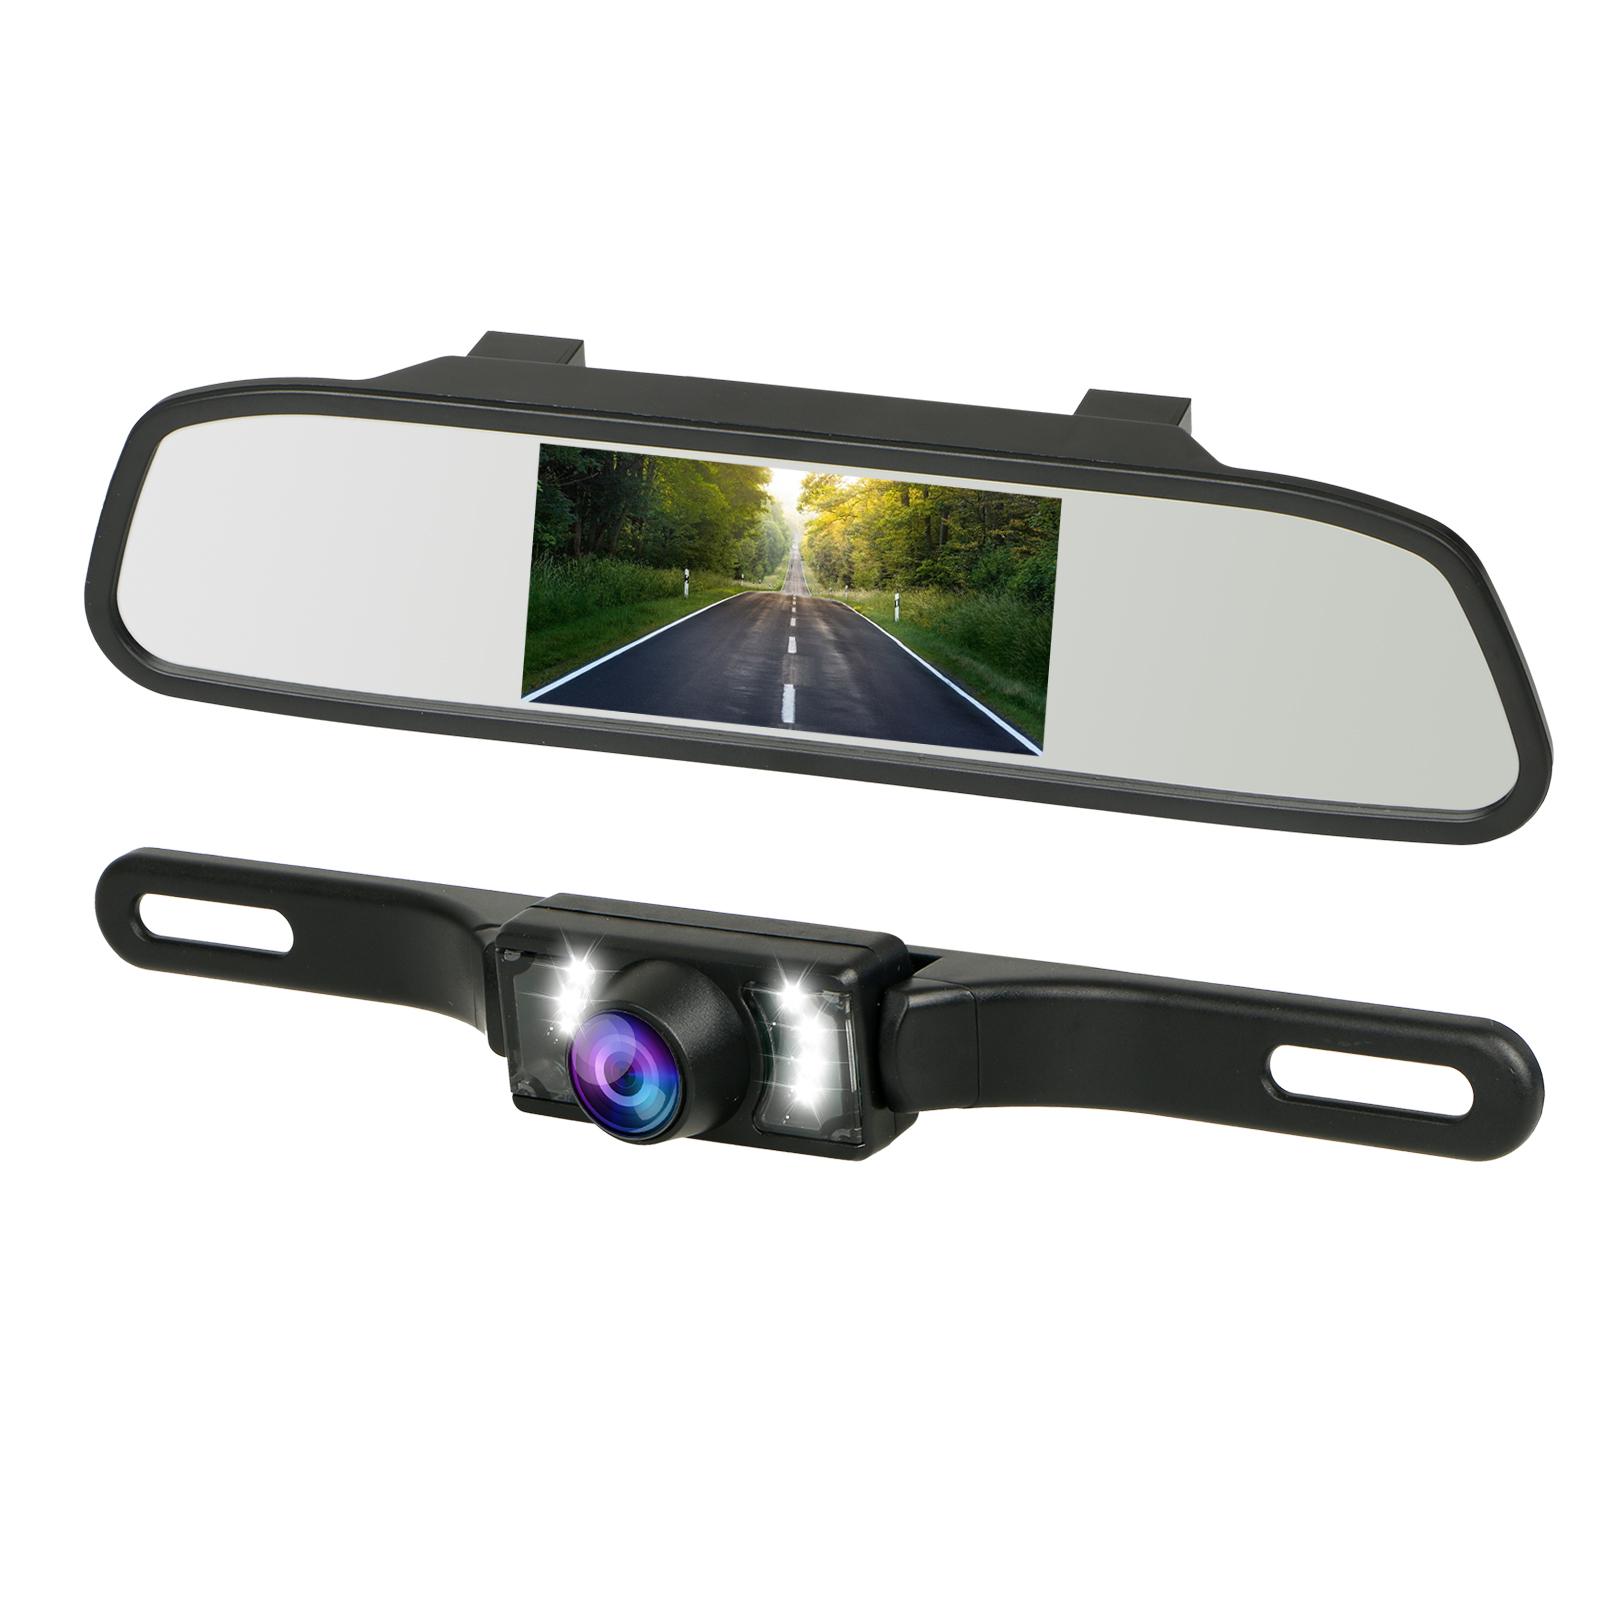 Car Rear View Camera Night Vision Parking System Kit, Universal Waterproof Rear-view License Plate Backup Camera + 4.3 Inch TFT LCD Adjustable Rear View Monitor